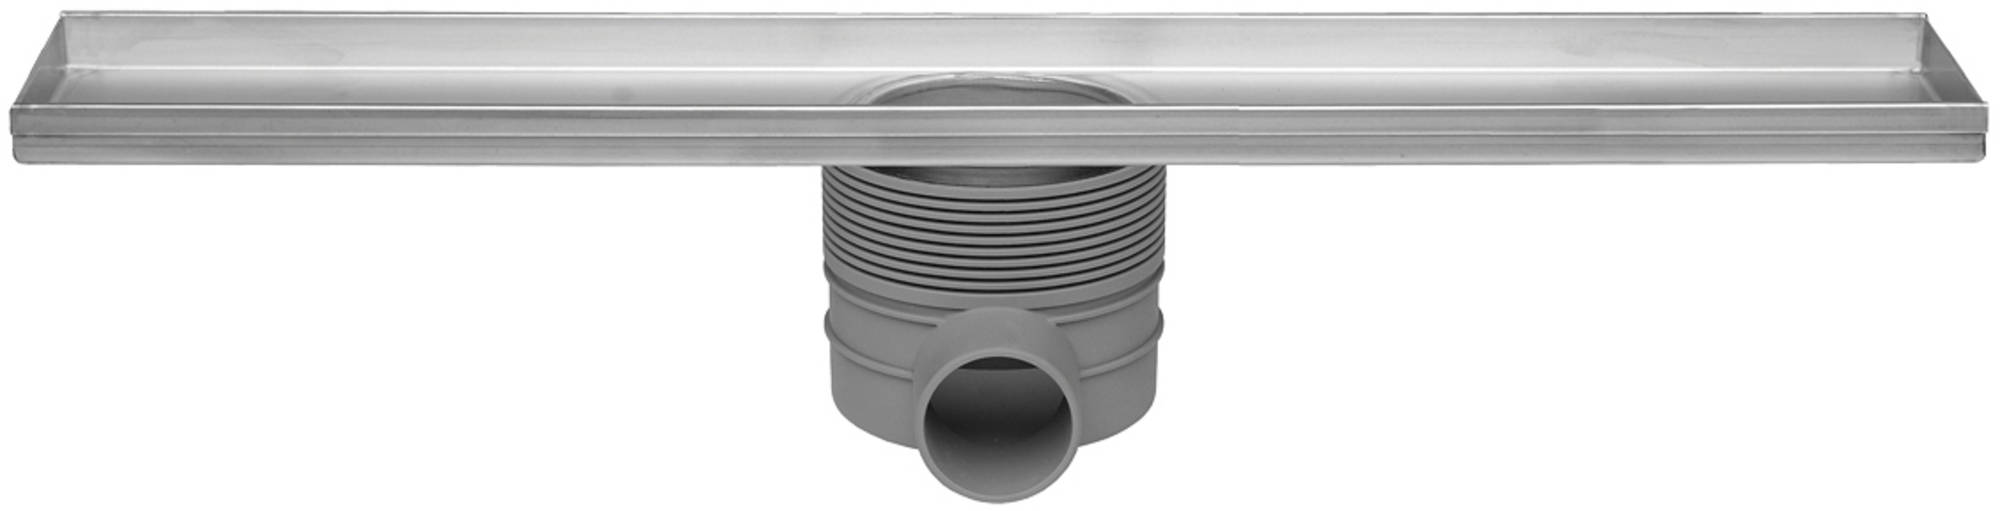 Easy Drain Multi inbouwdeel drain 80 cm zonder rooster RVS